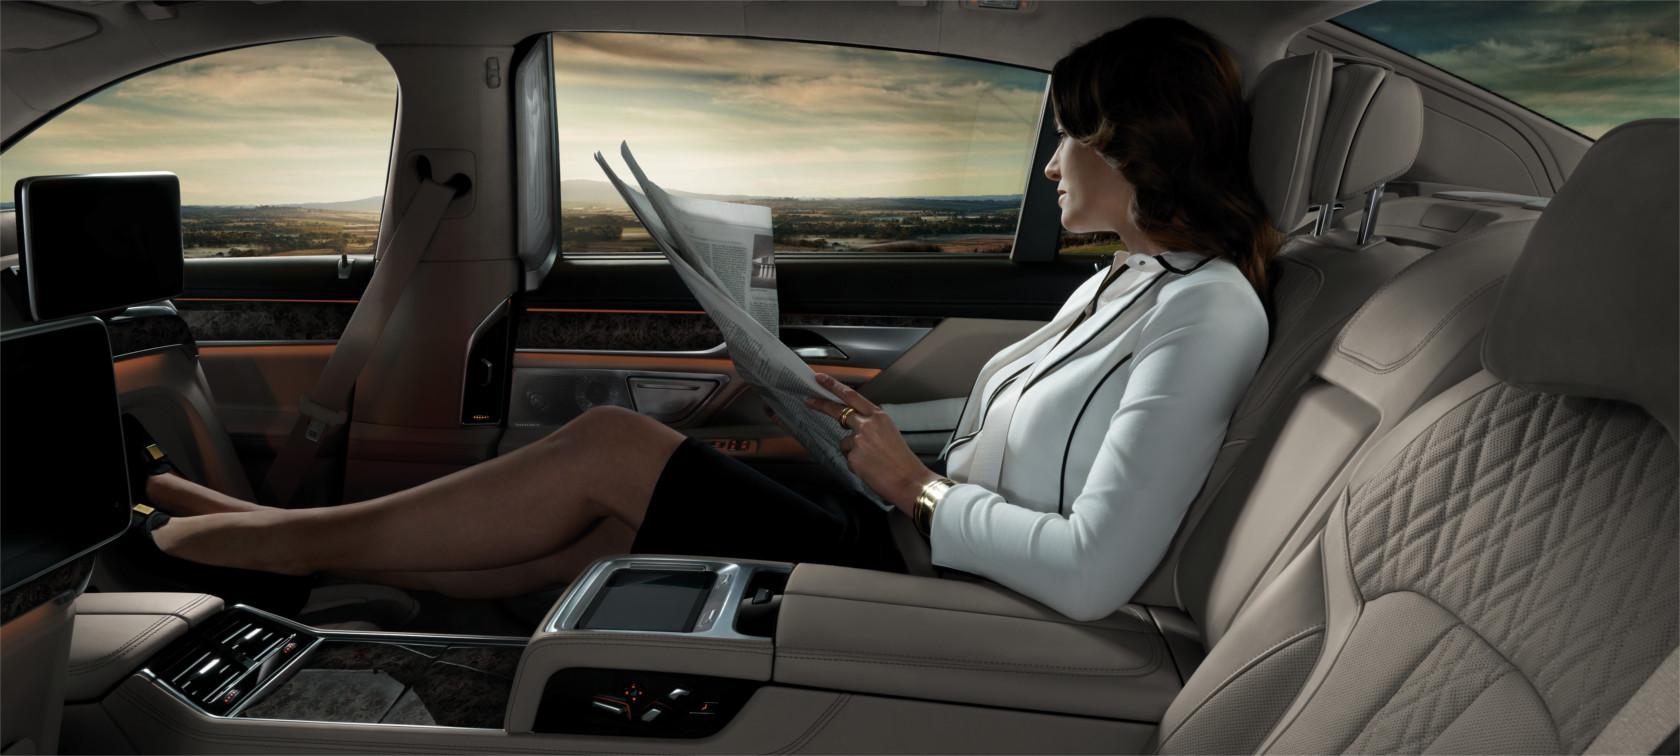 Bmw 7er Limousine Komfort Amp Ambiente